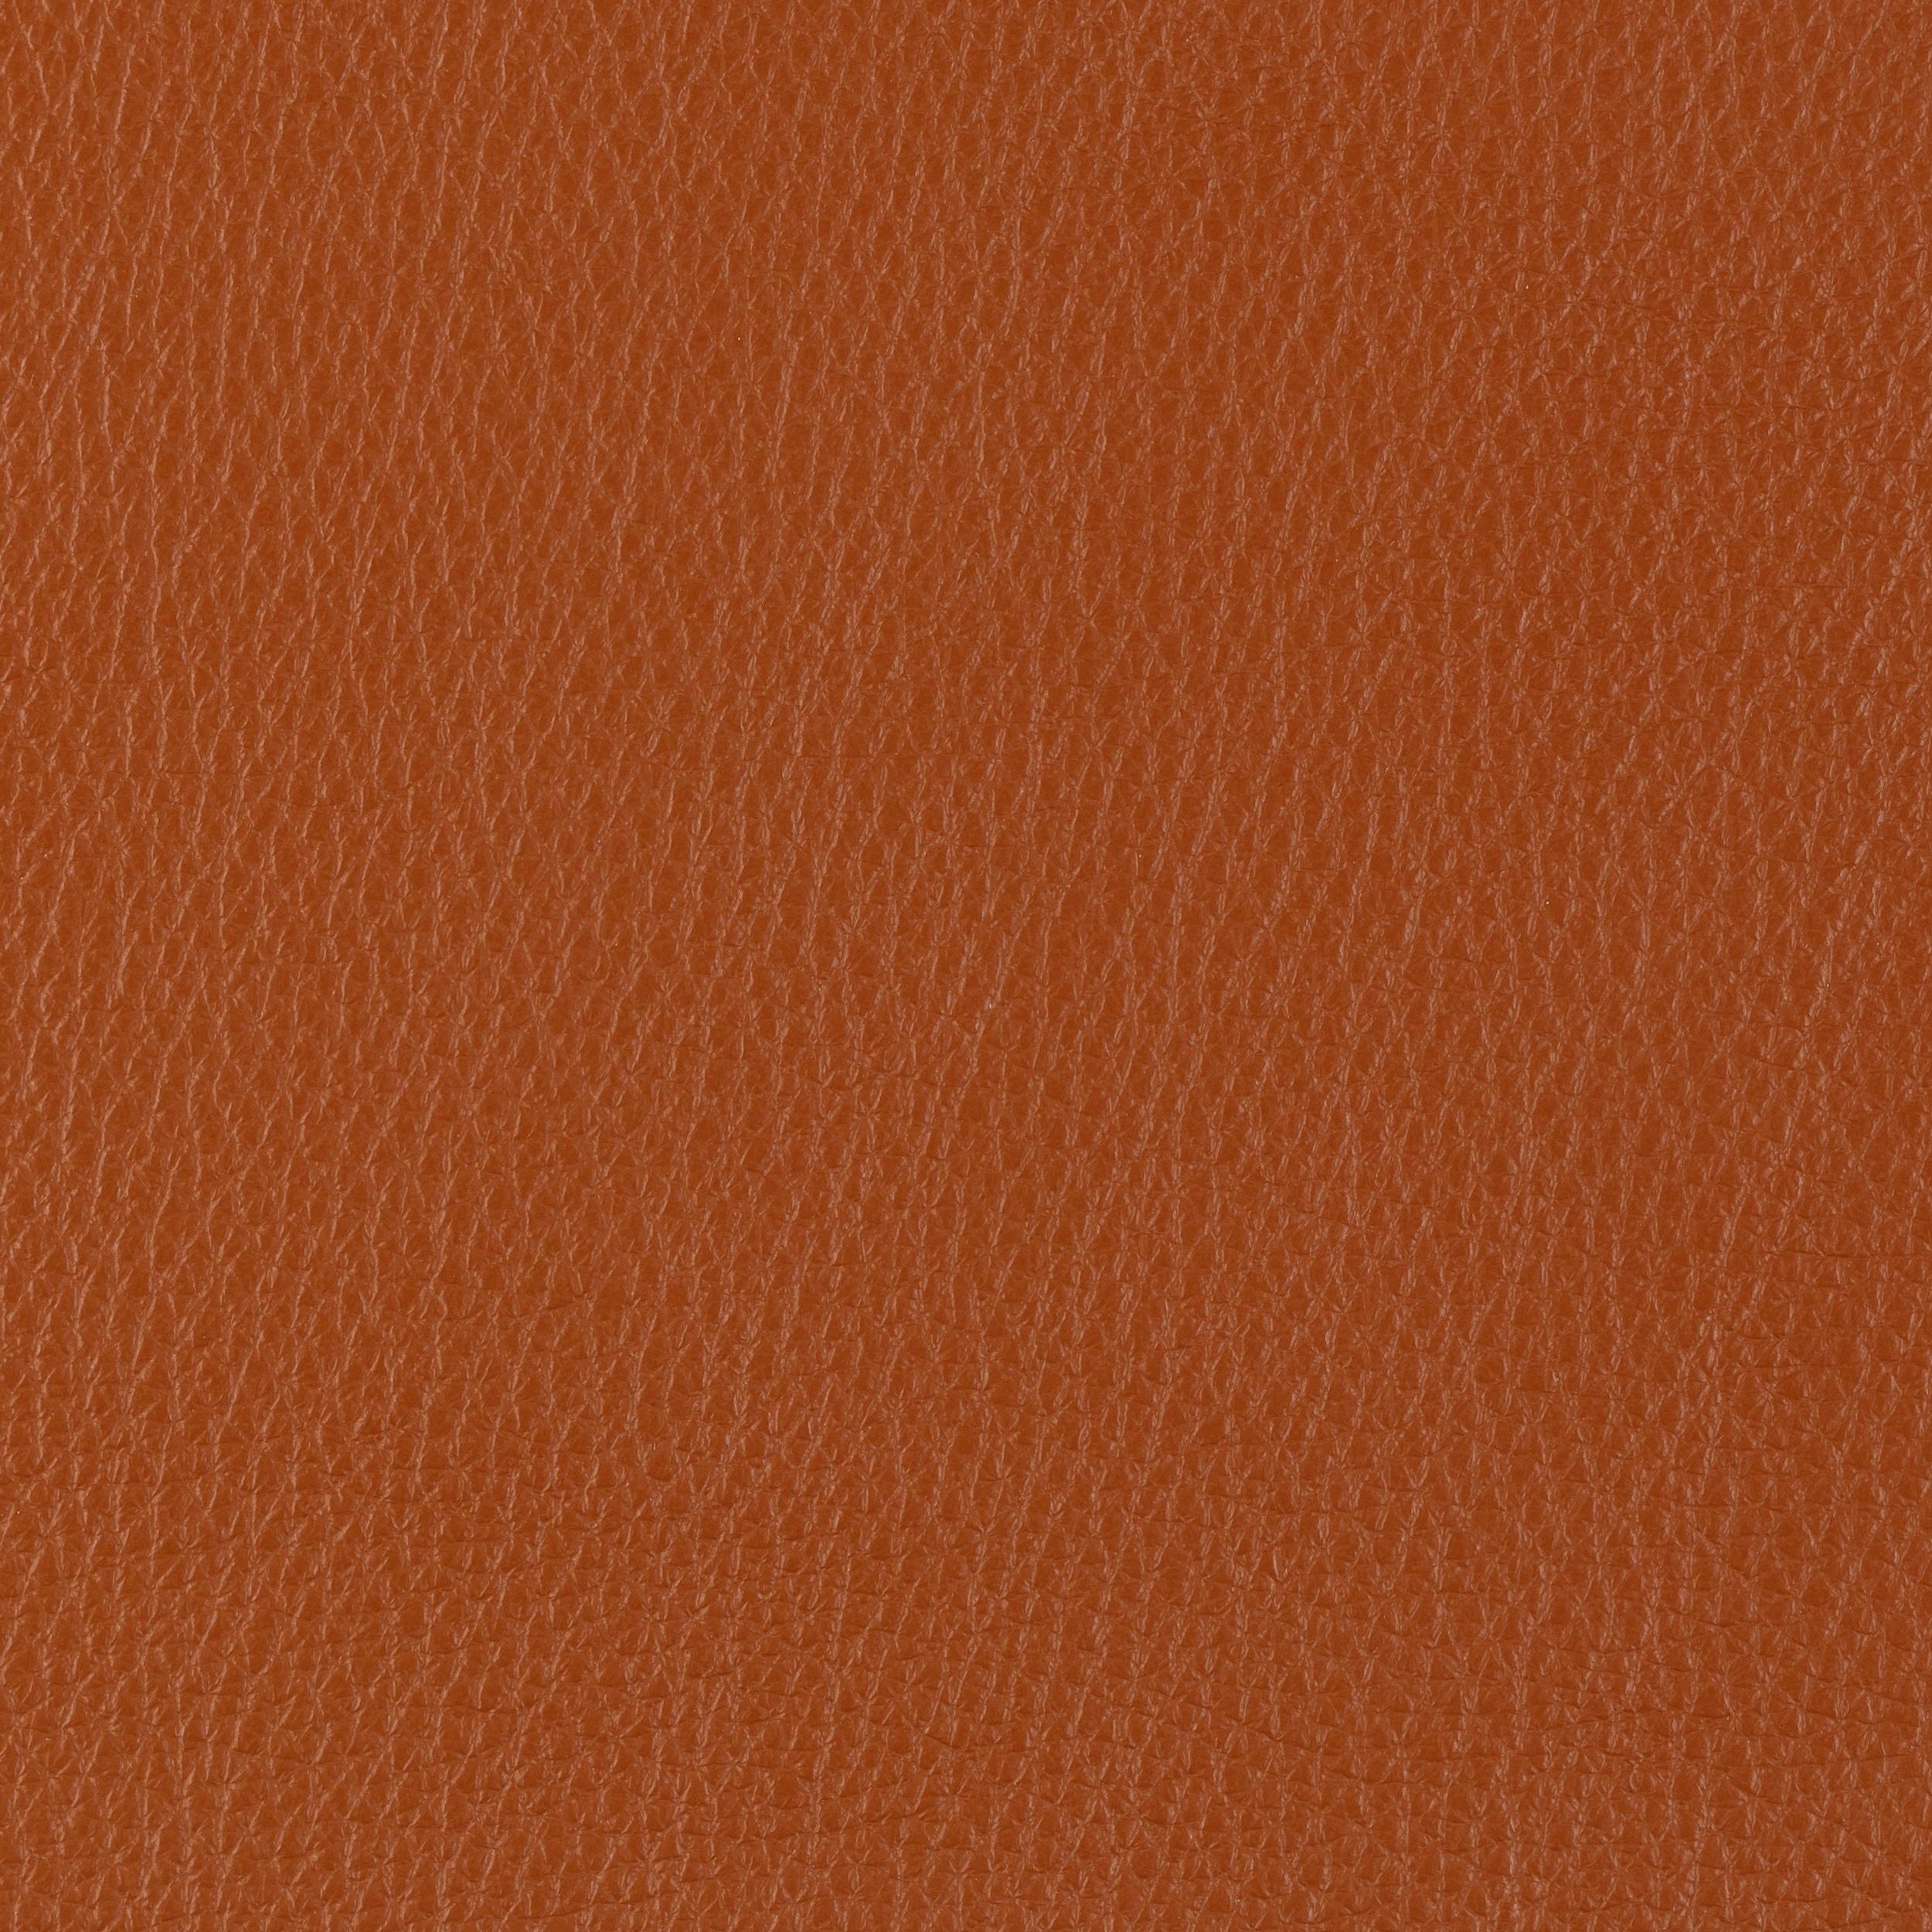 favius Wandspiegel Hide cognac Eiche